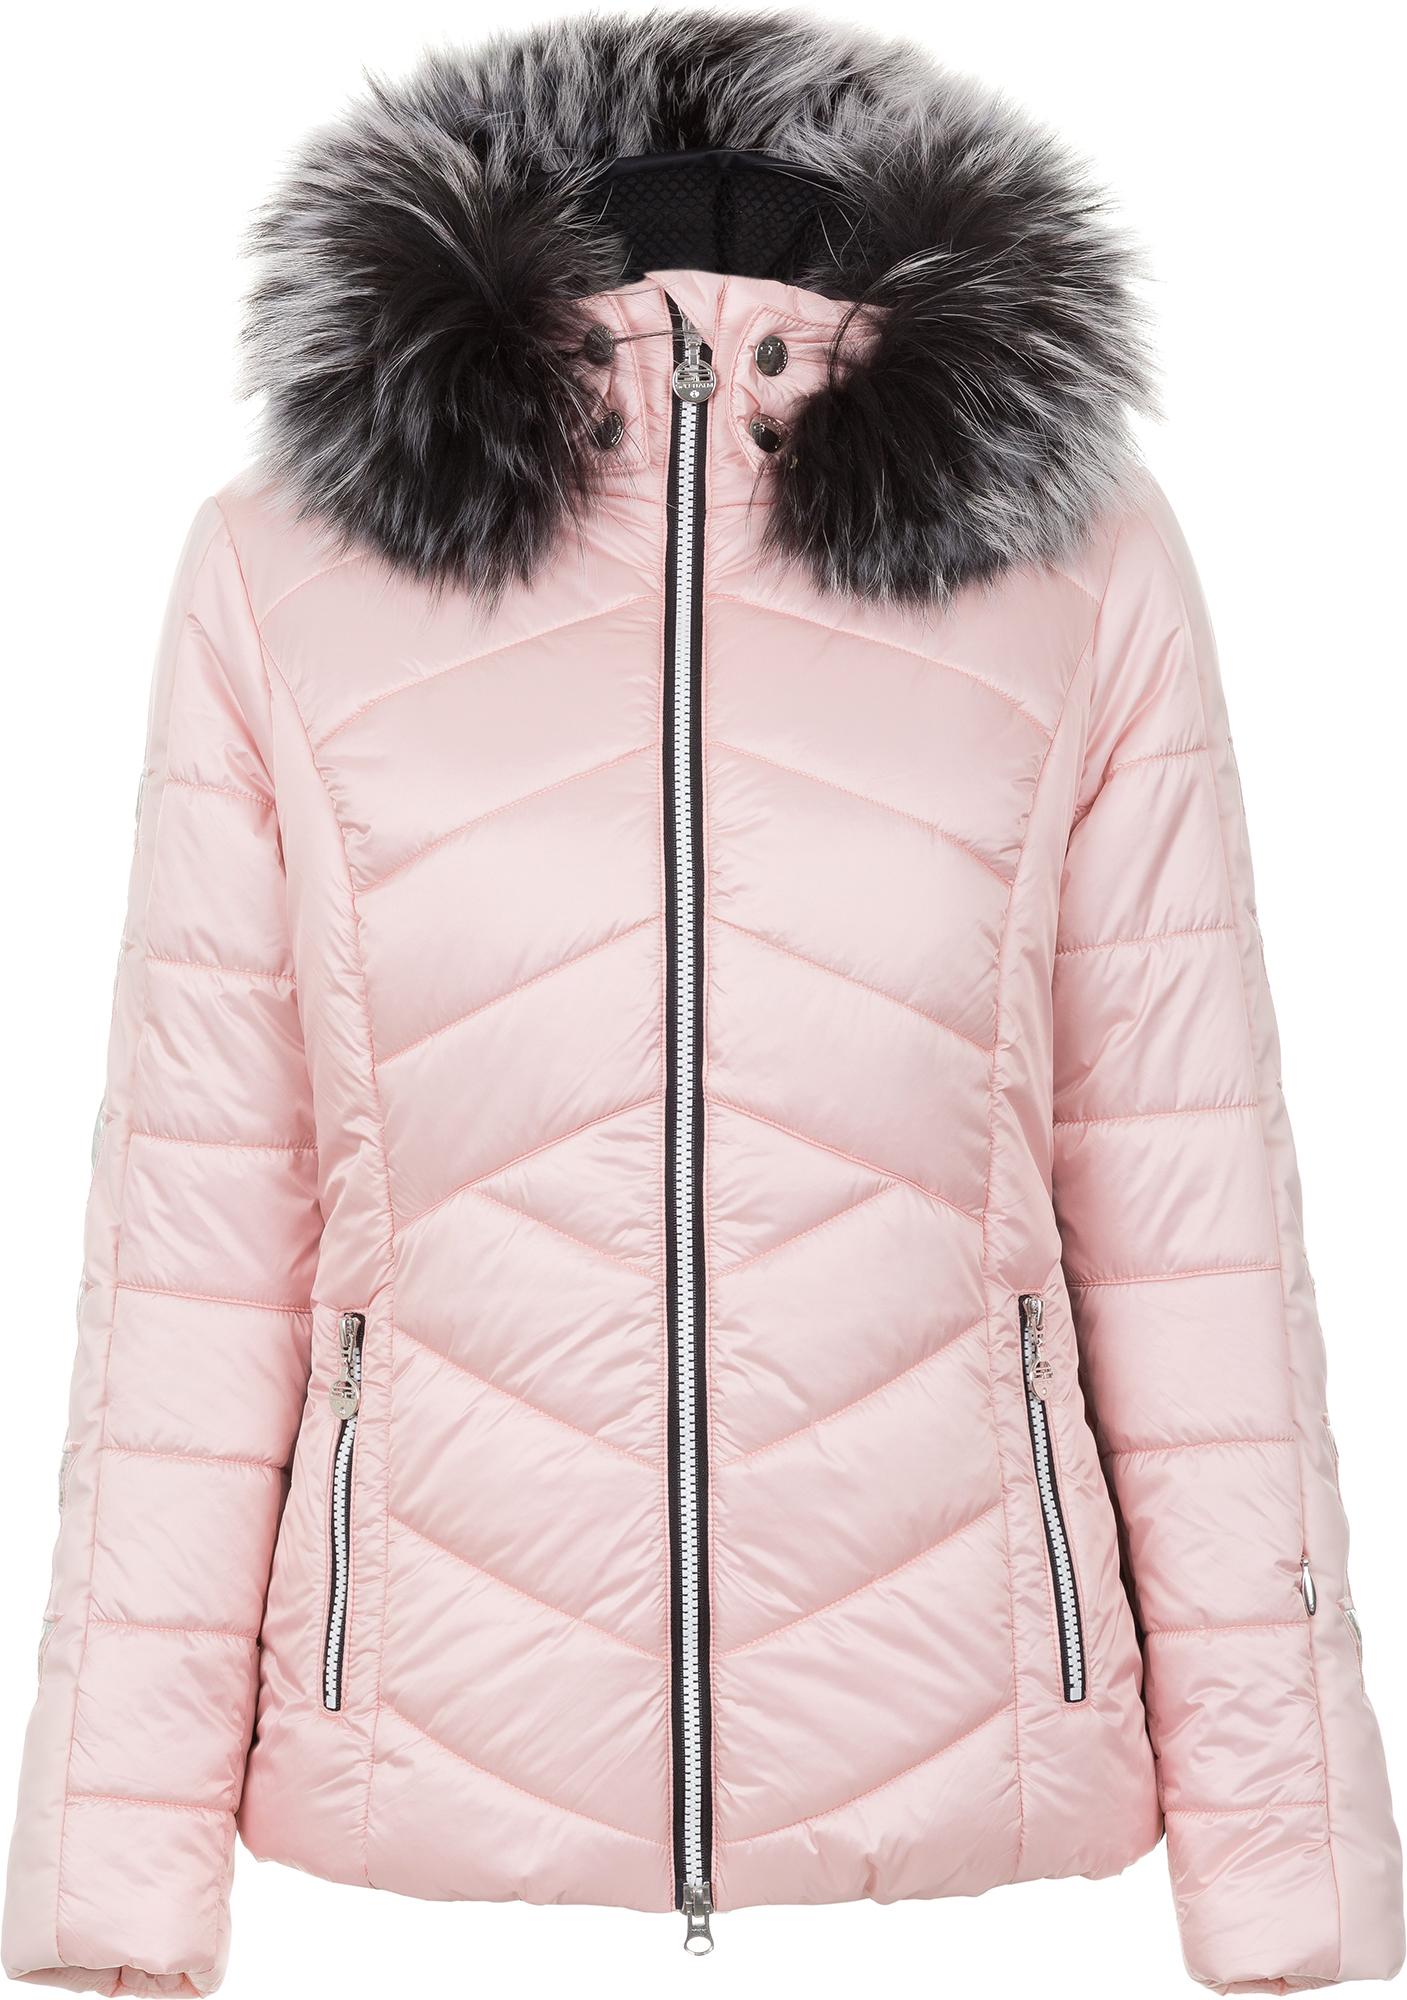 Sportalm Куртка утепленная женская Blanche, размер 48